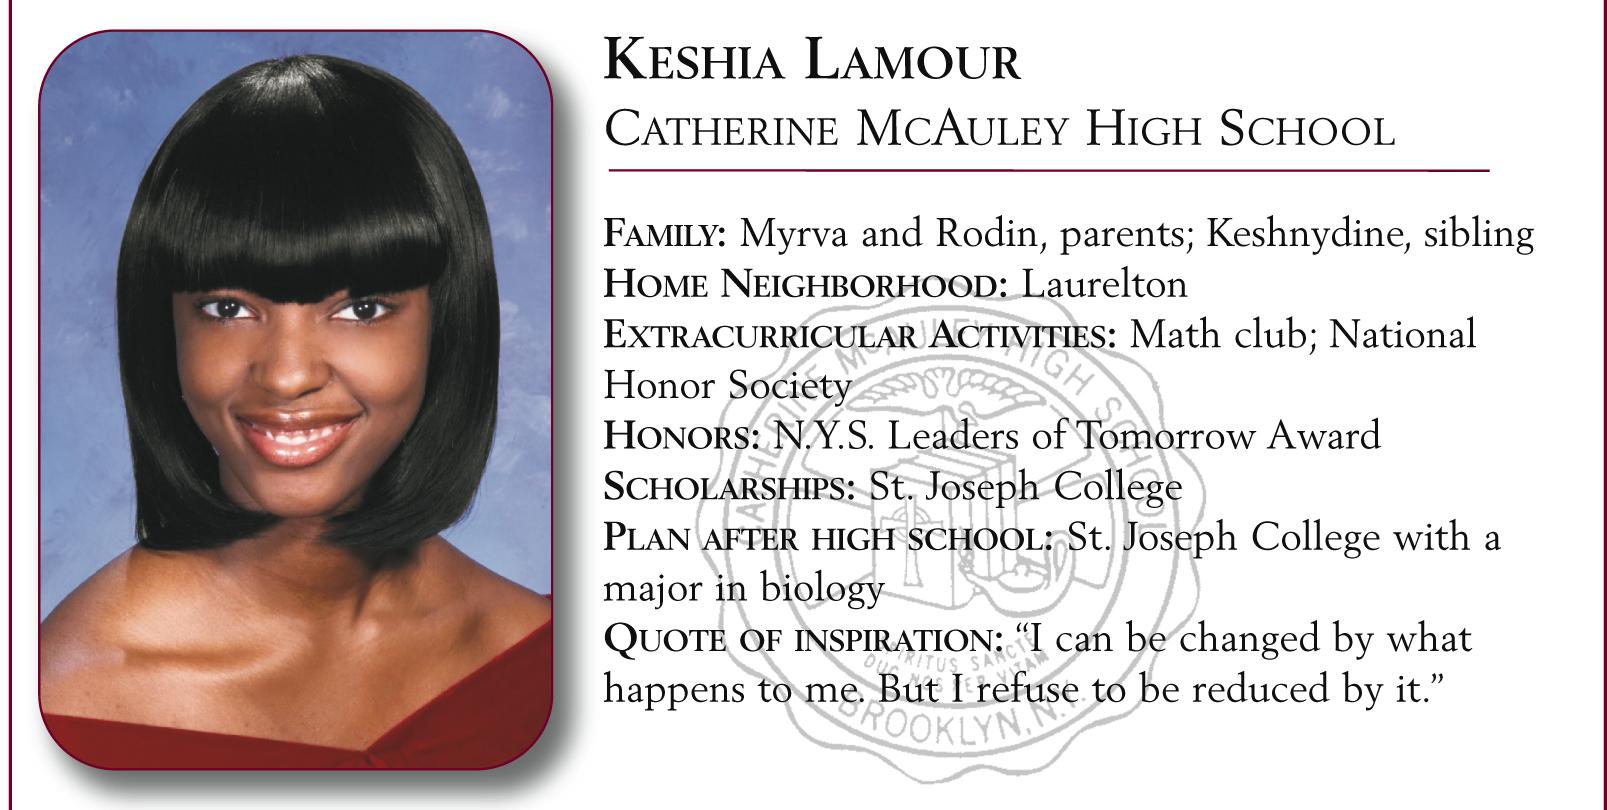 Keshia Lamour, Catherine McAuley High School